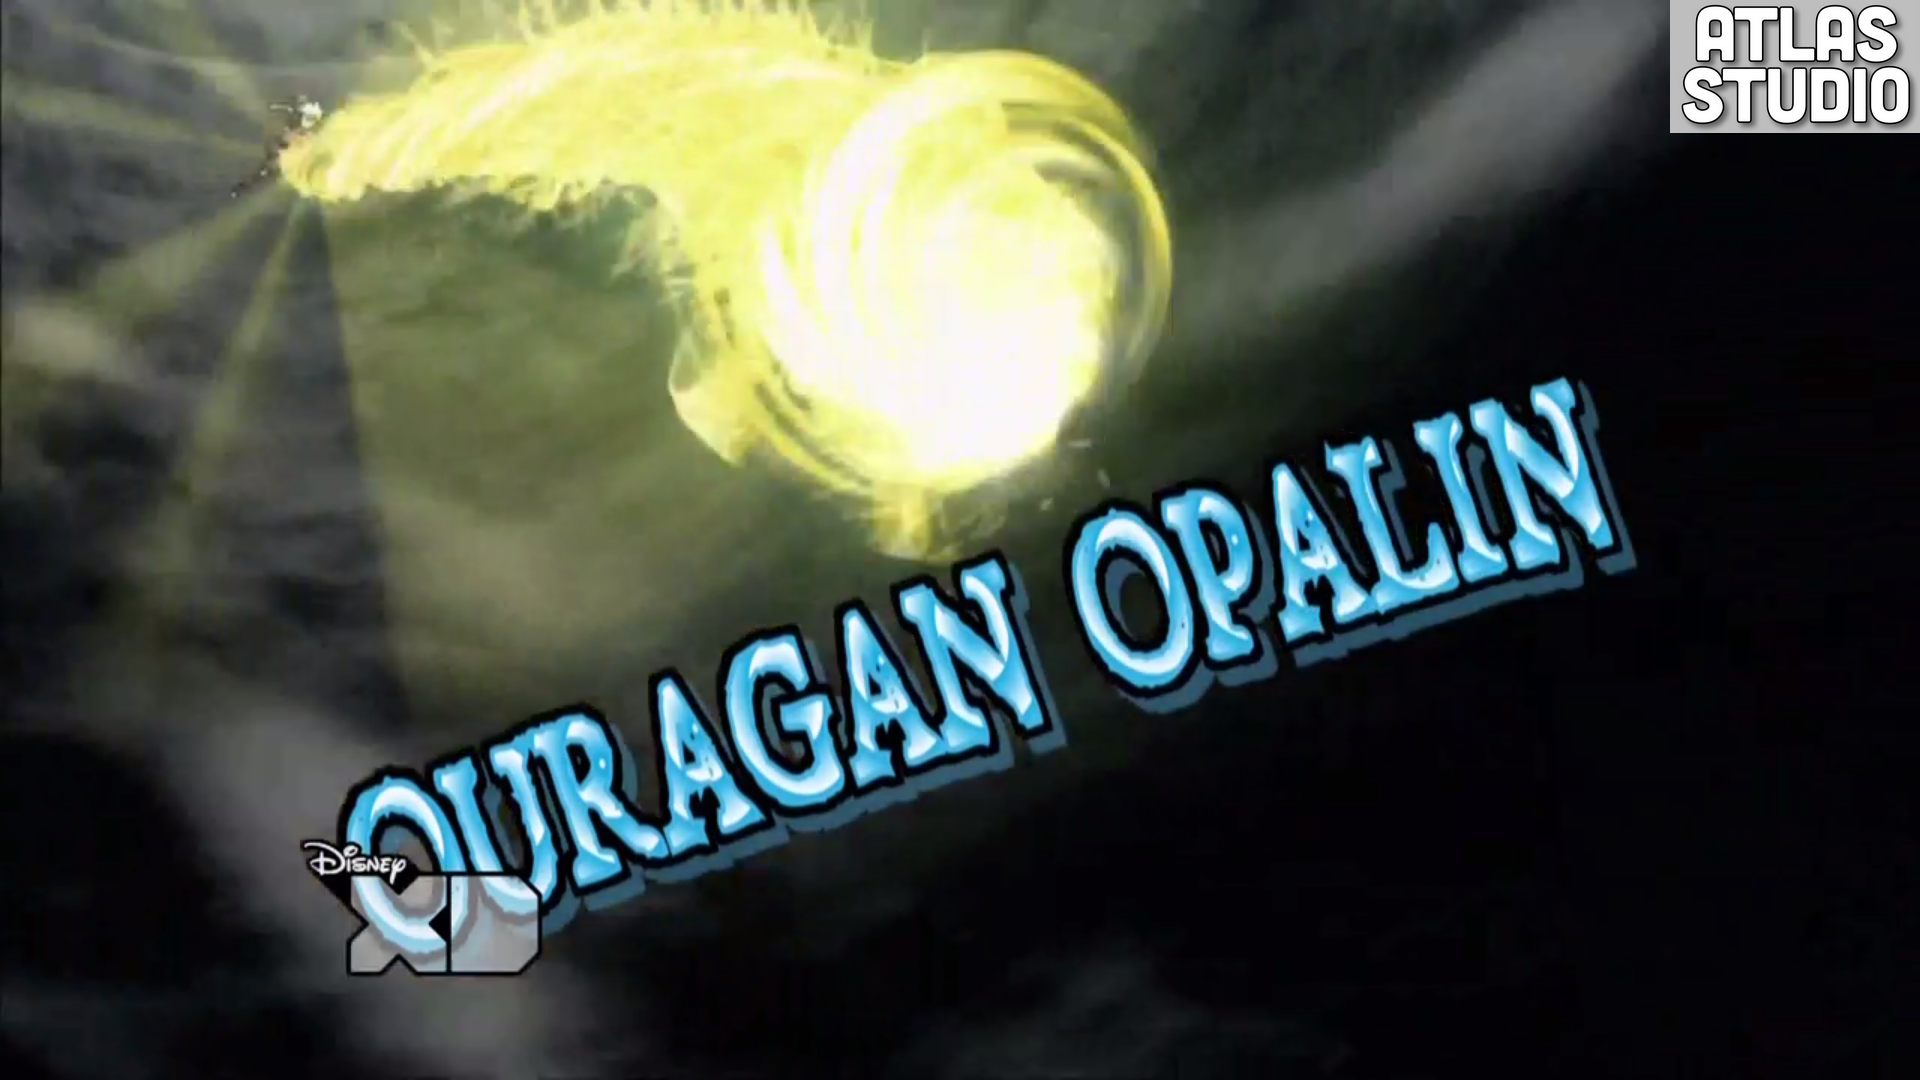 Ouragan Opalin